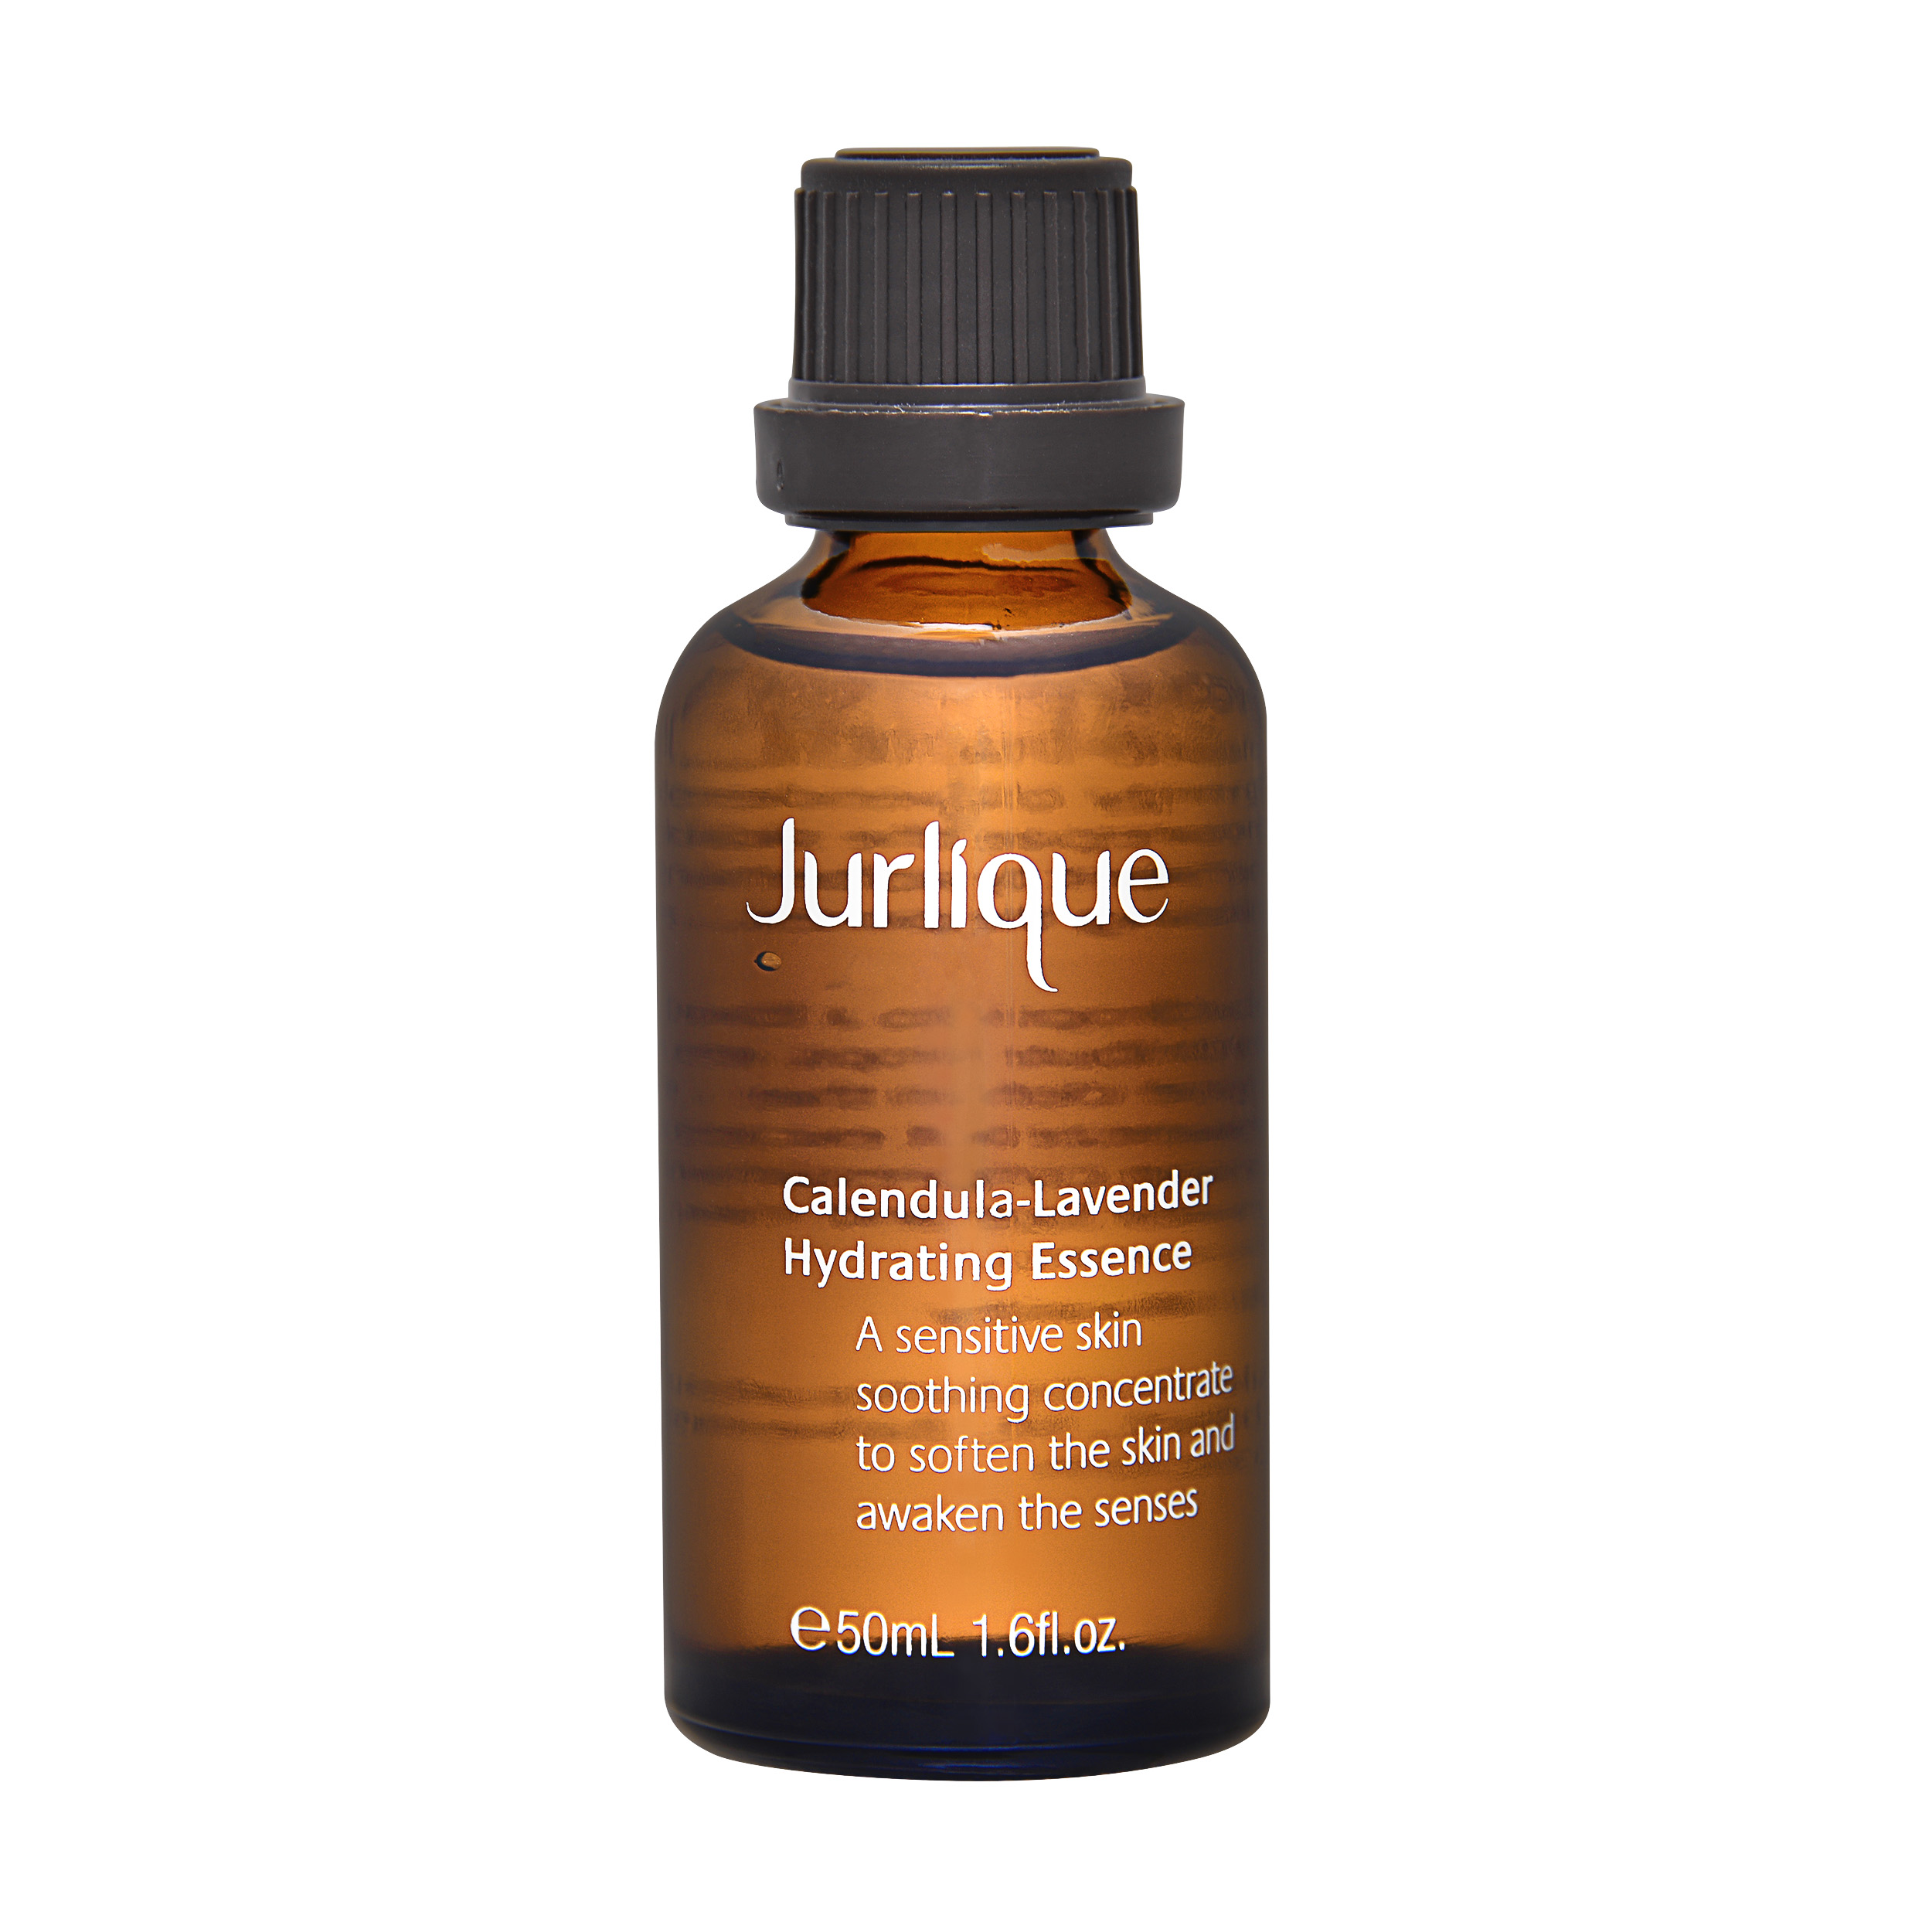 Jurlique  Calendula-Lavender Hydrating Essence 1.6oz, 50ml